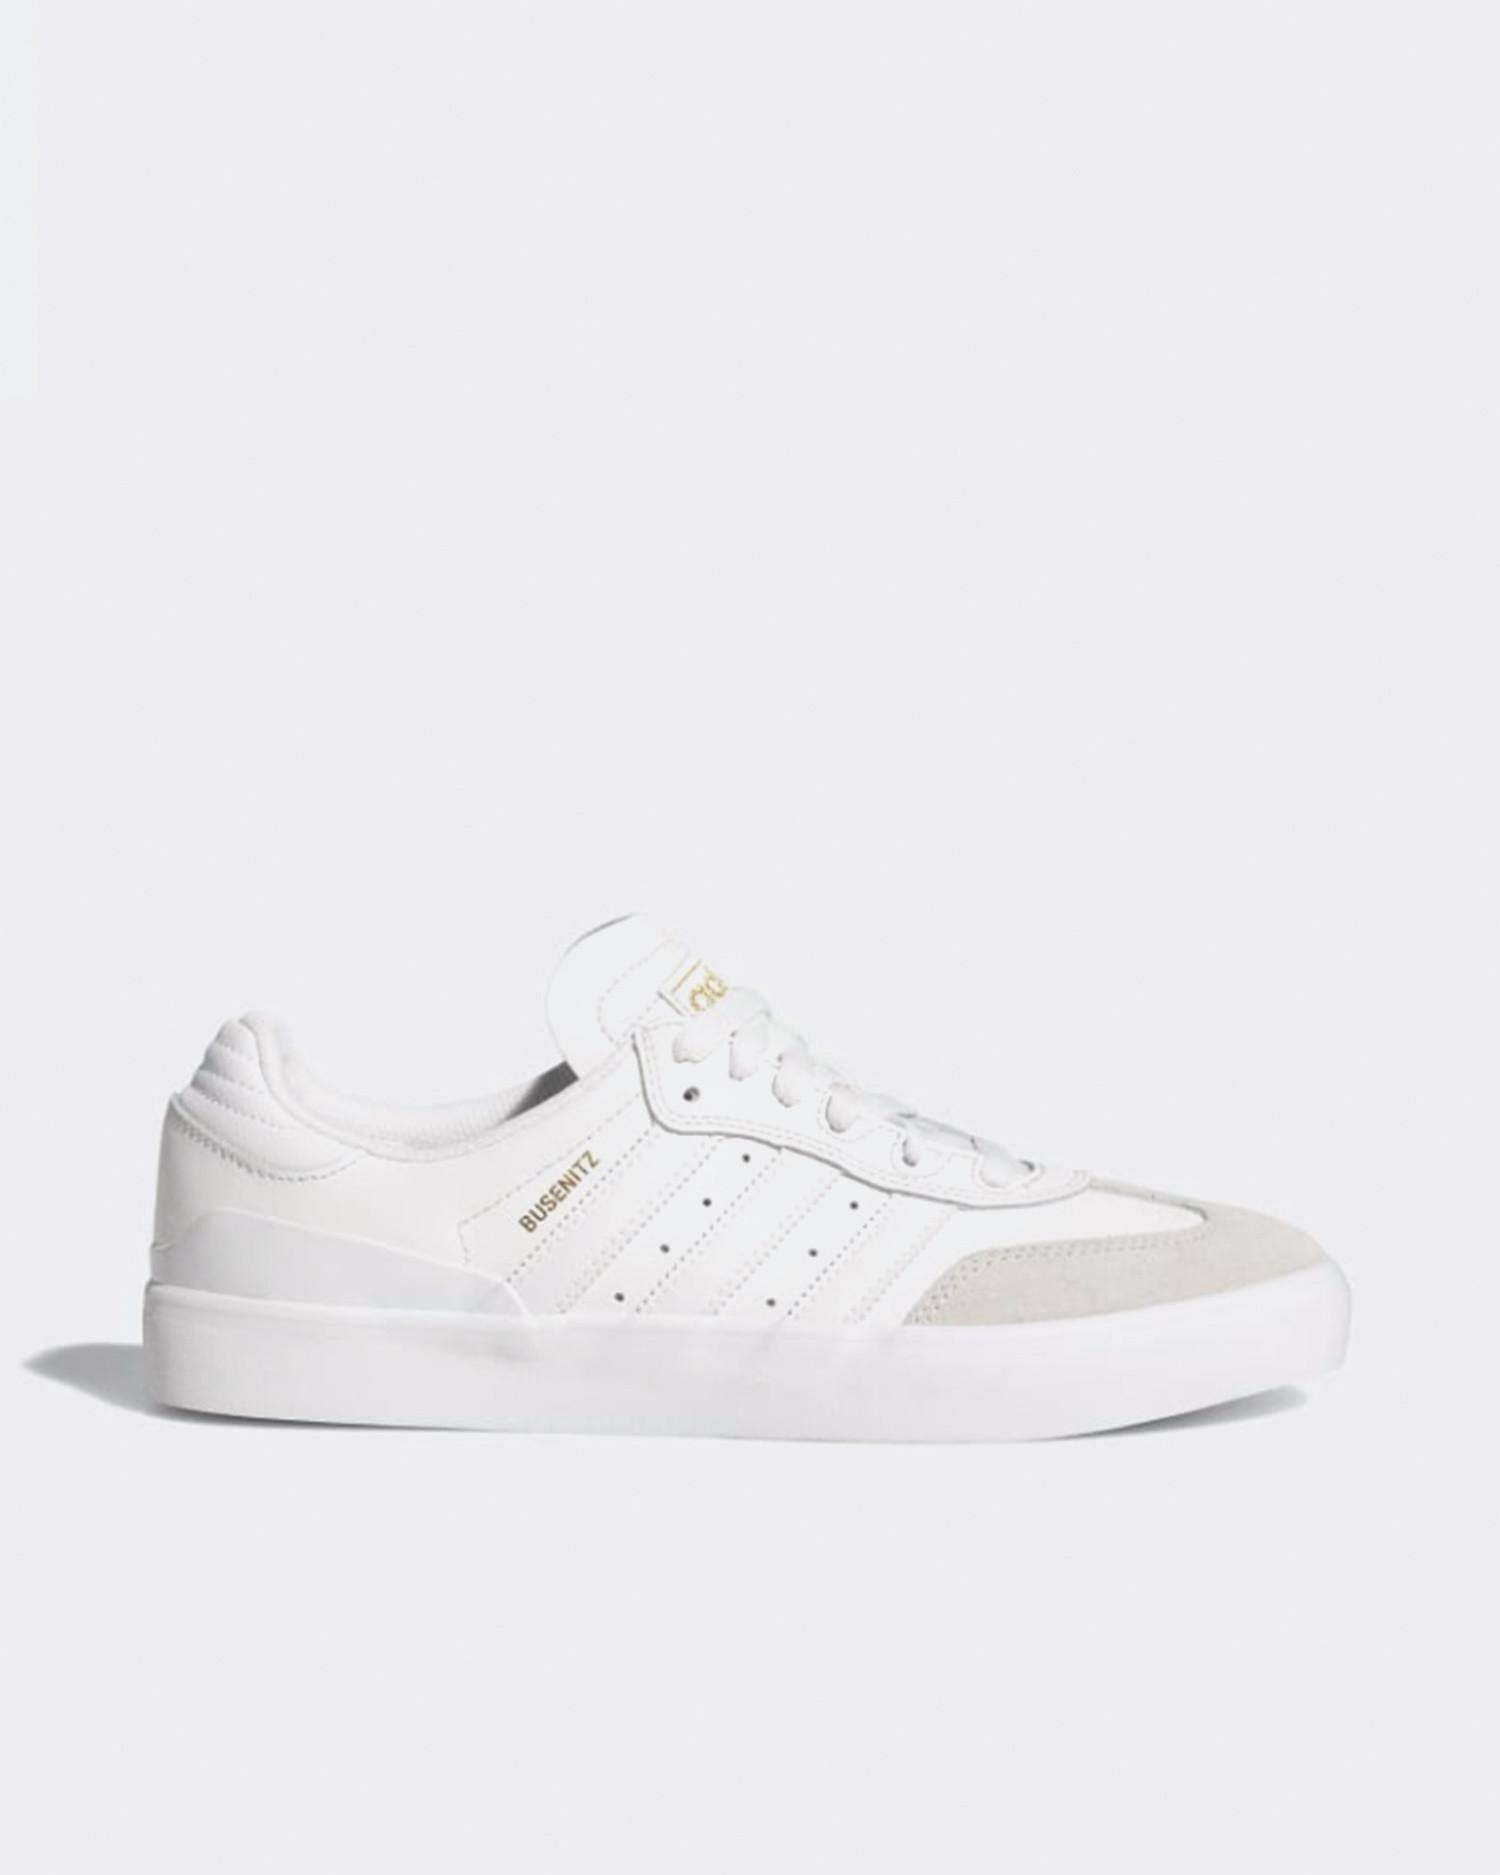 Adidas Busenitz vulc rx Crystal White/Black/Gold Metallic